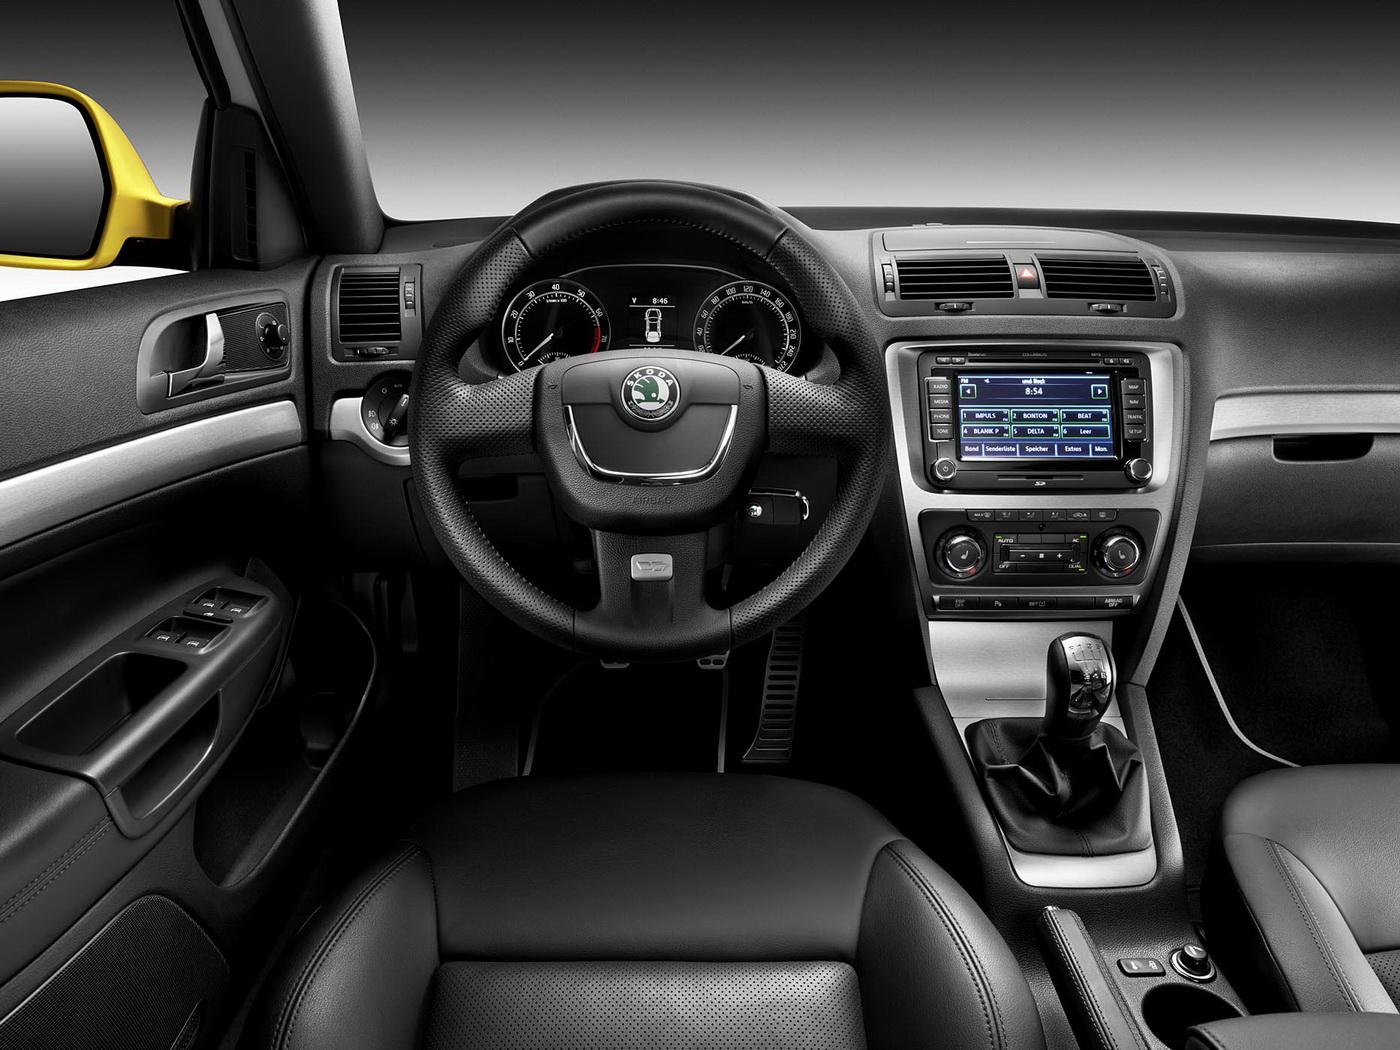 Skoda Octavia RS technical details, history, photos on Better